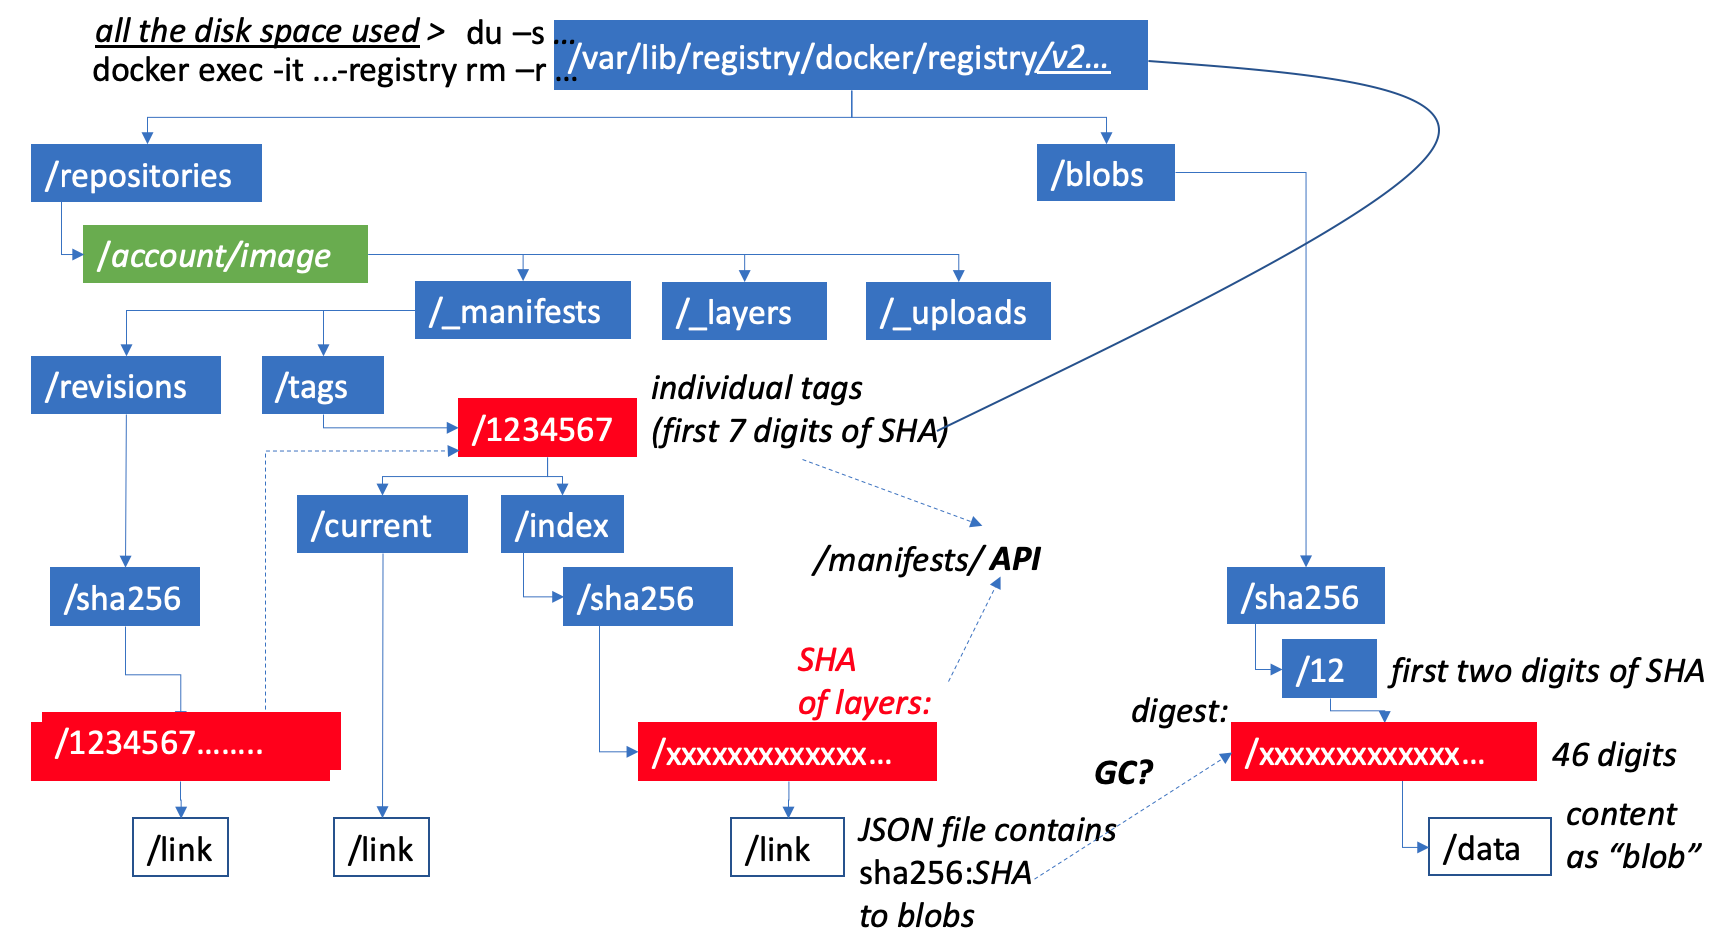 dockerreg-structure-v03-1727x947.png